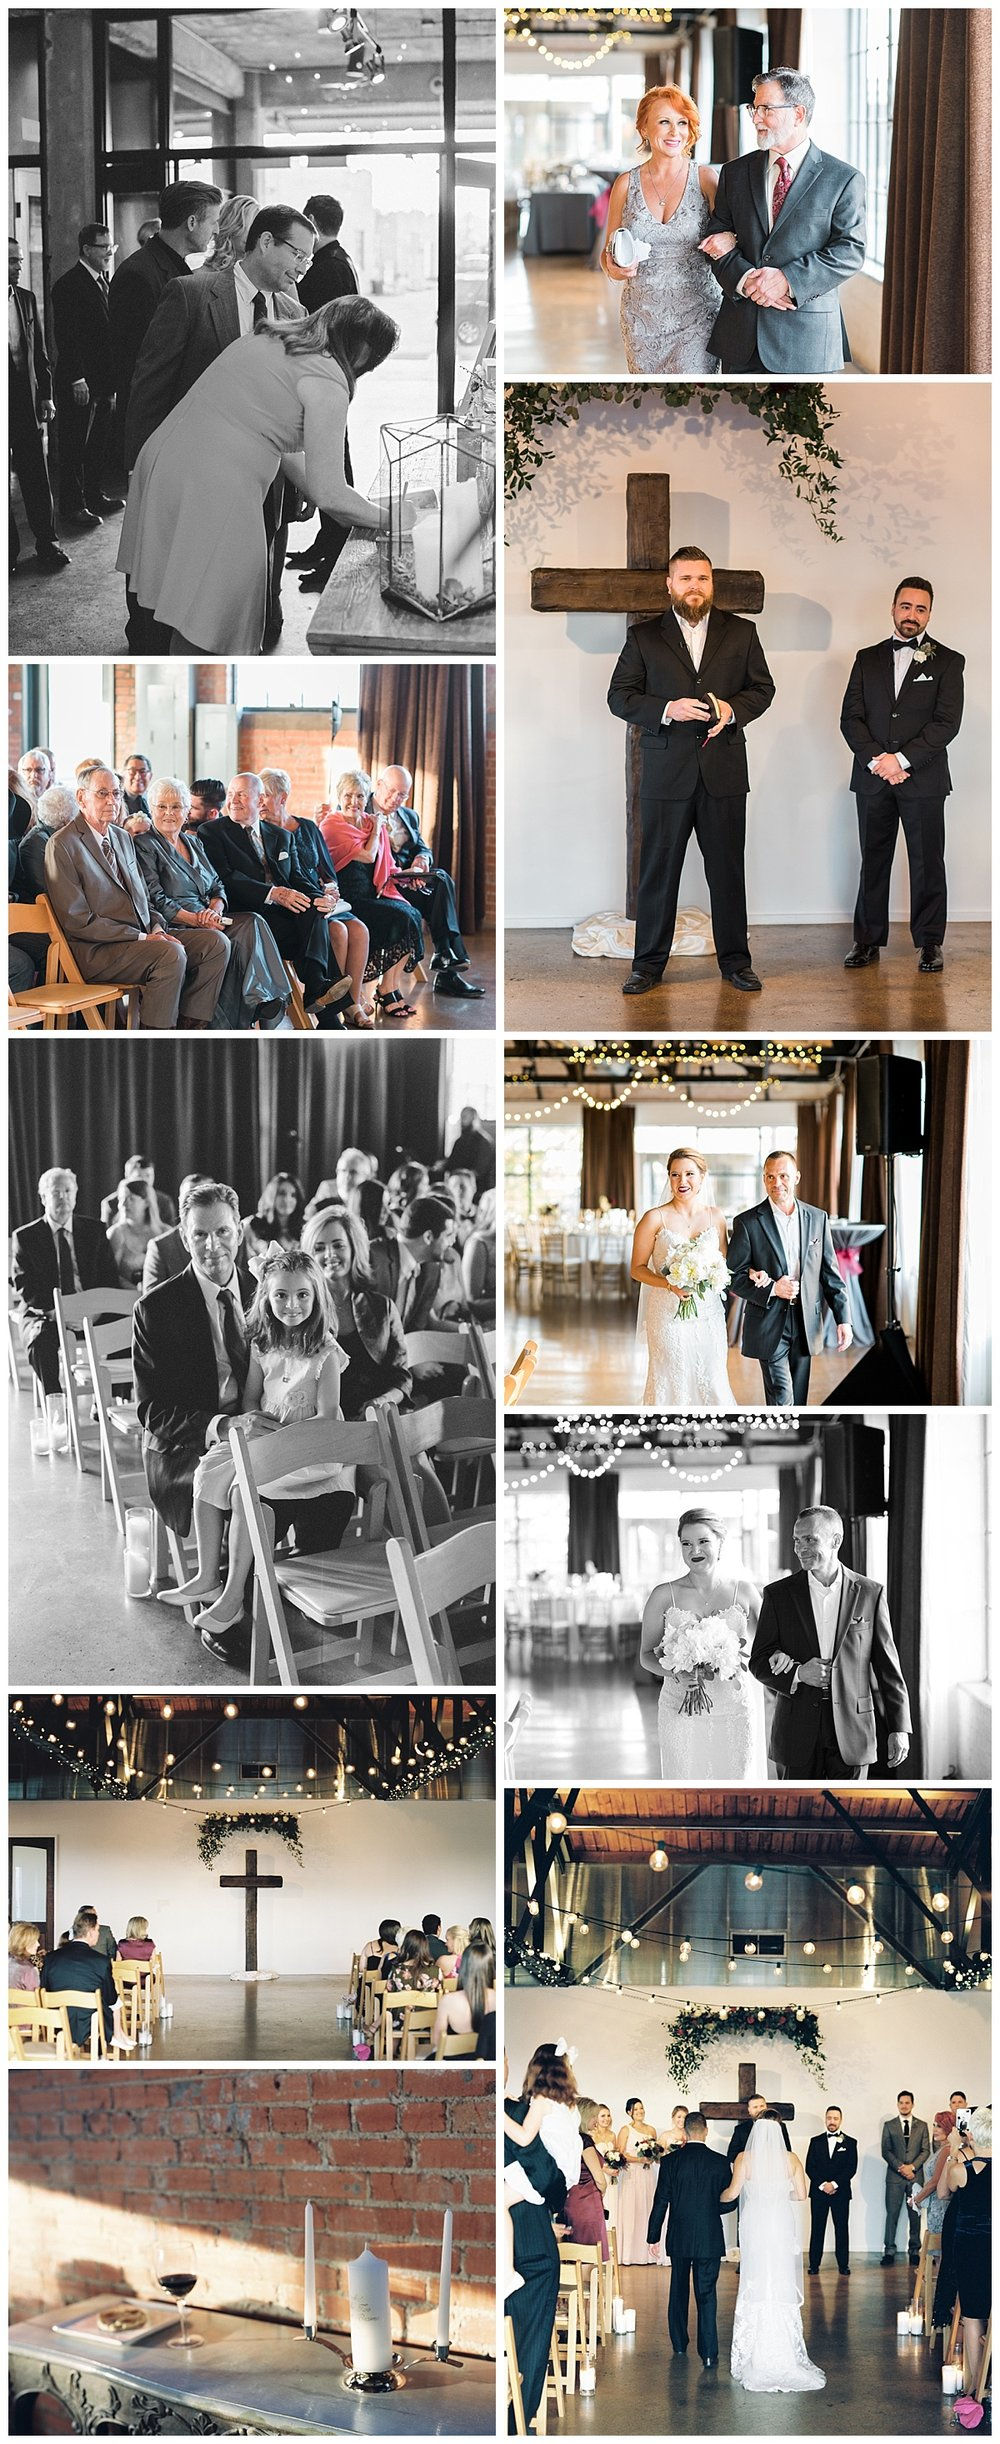 hickory-stree-annex-wedding-ar-photography-nicole-nolan-10.jpg